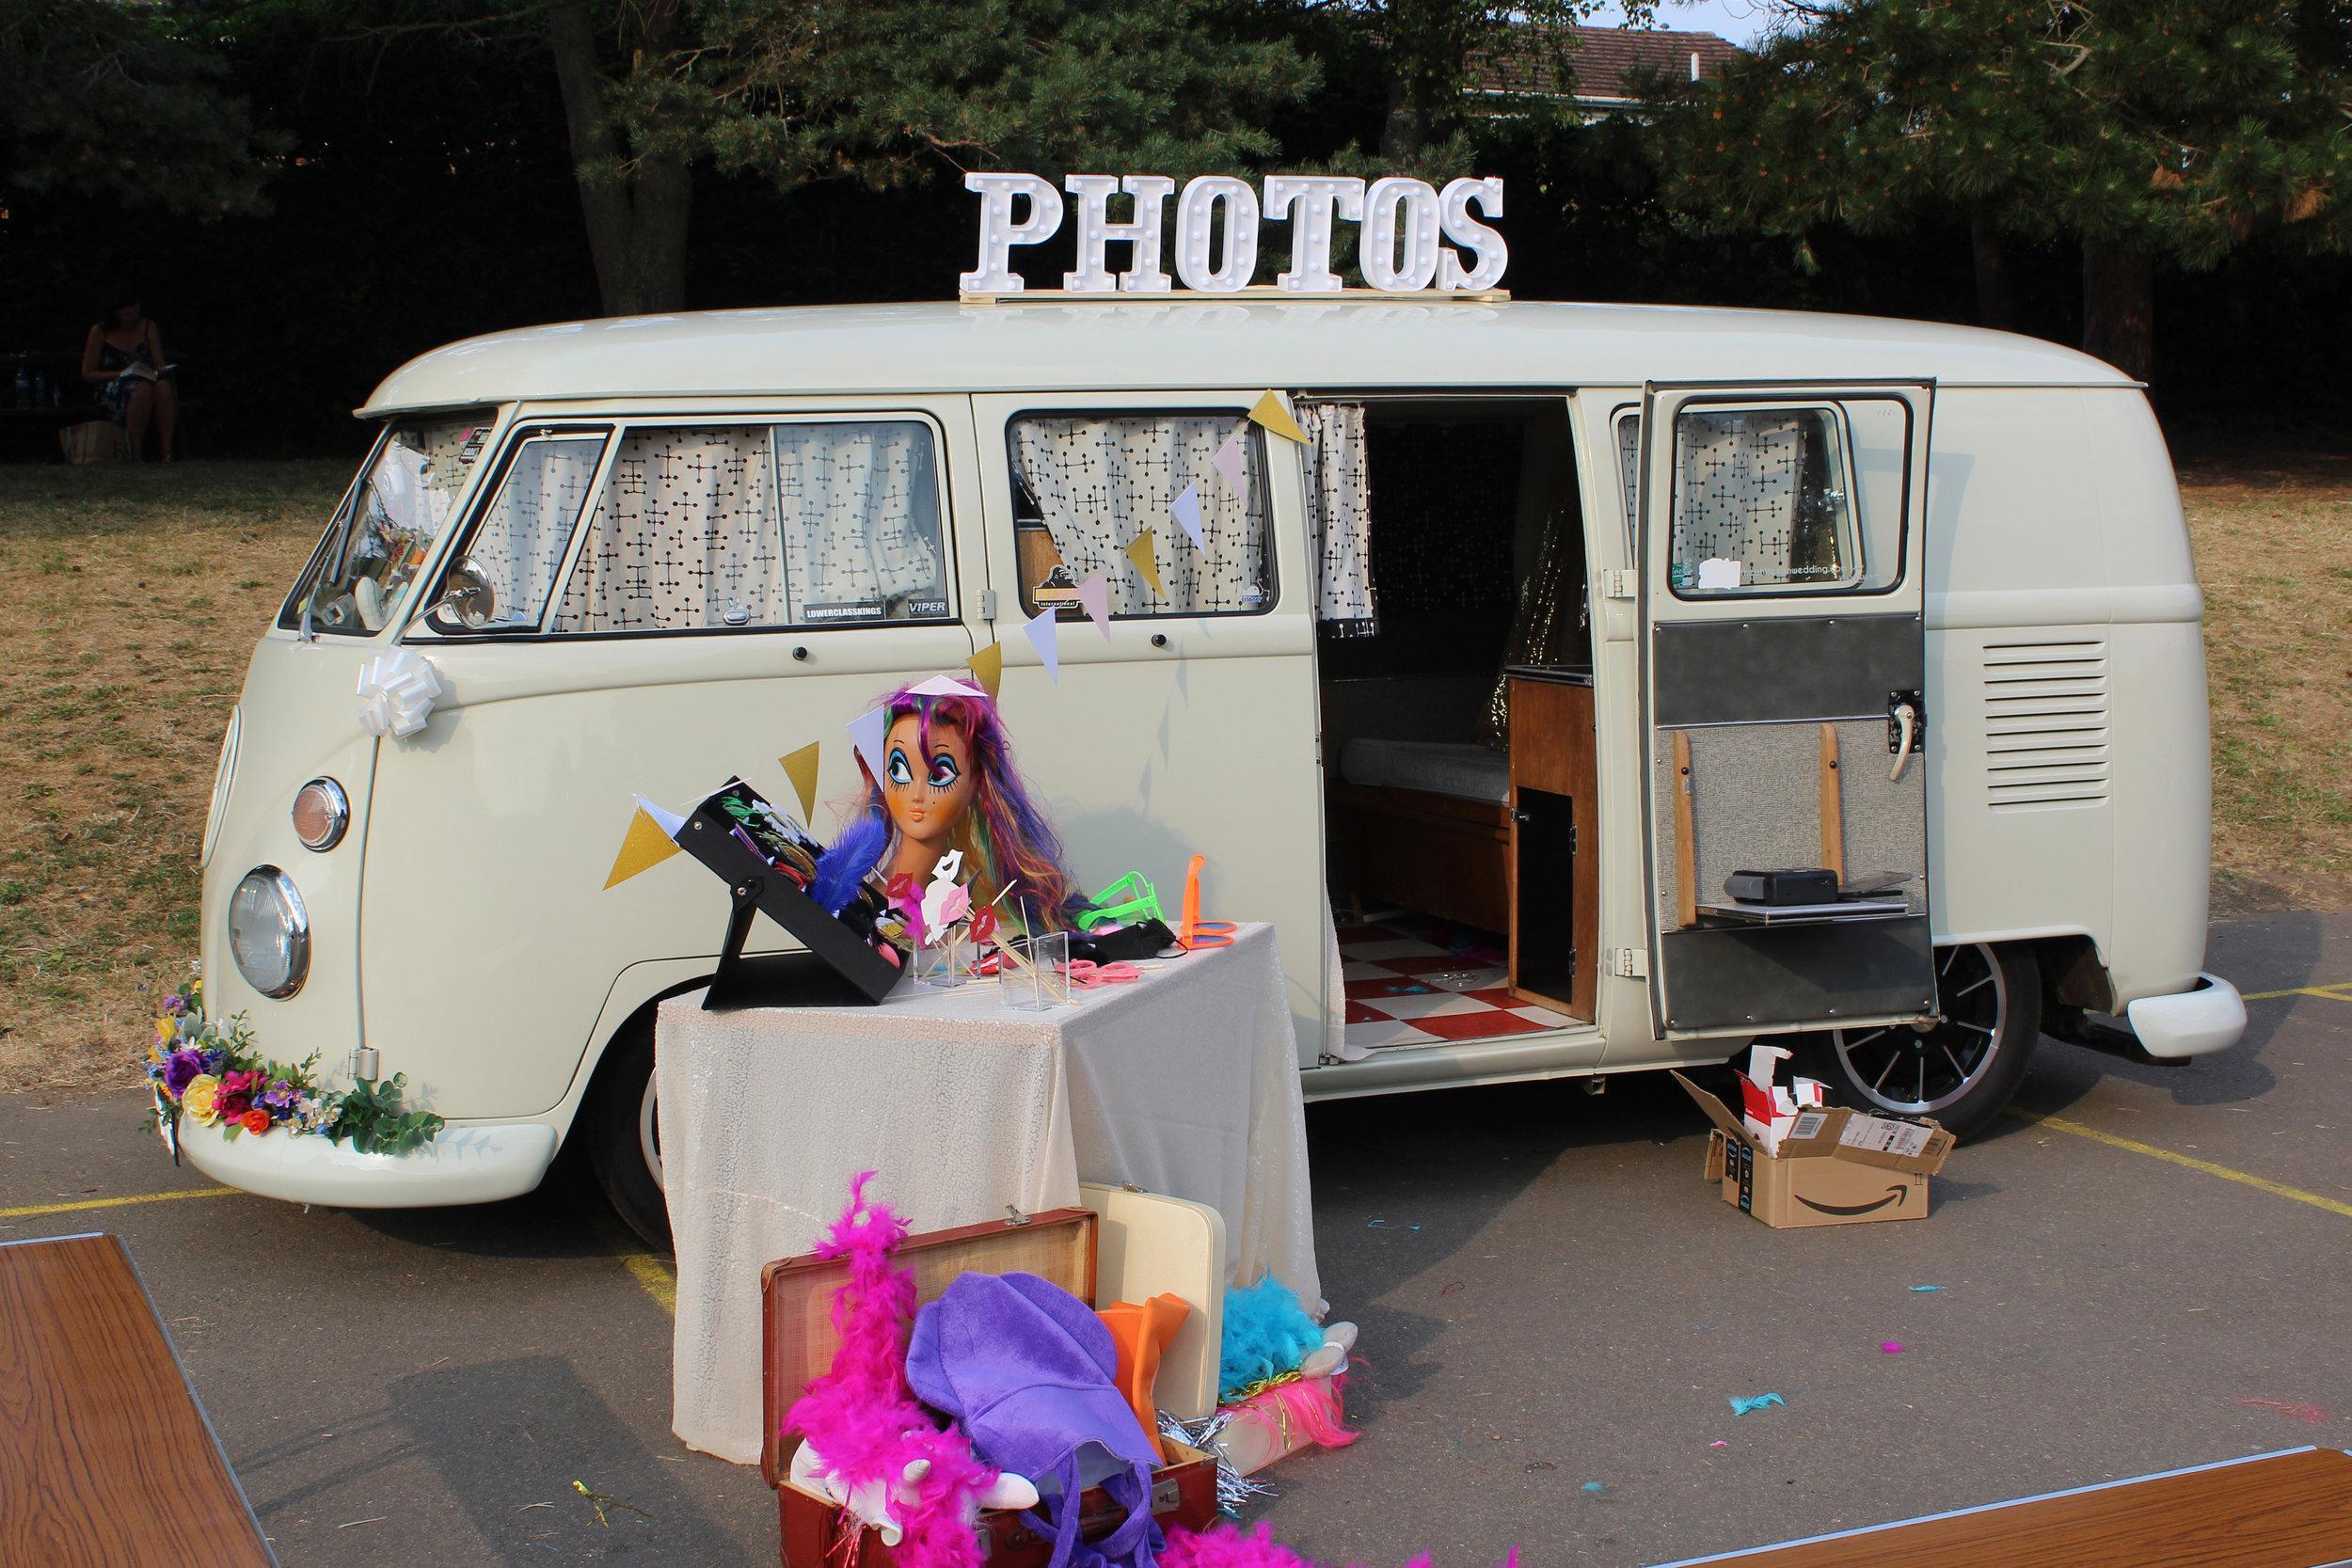 photo-booth-orpington.jpg